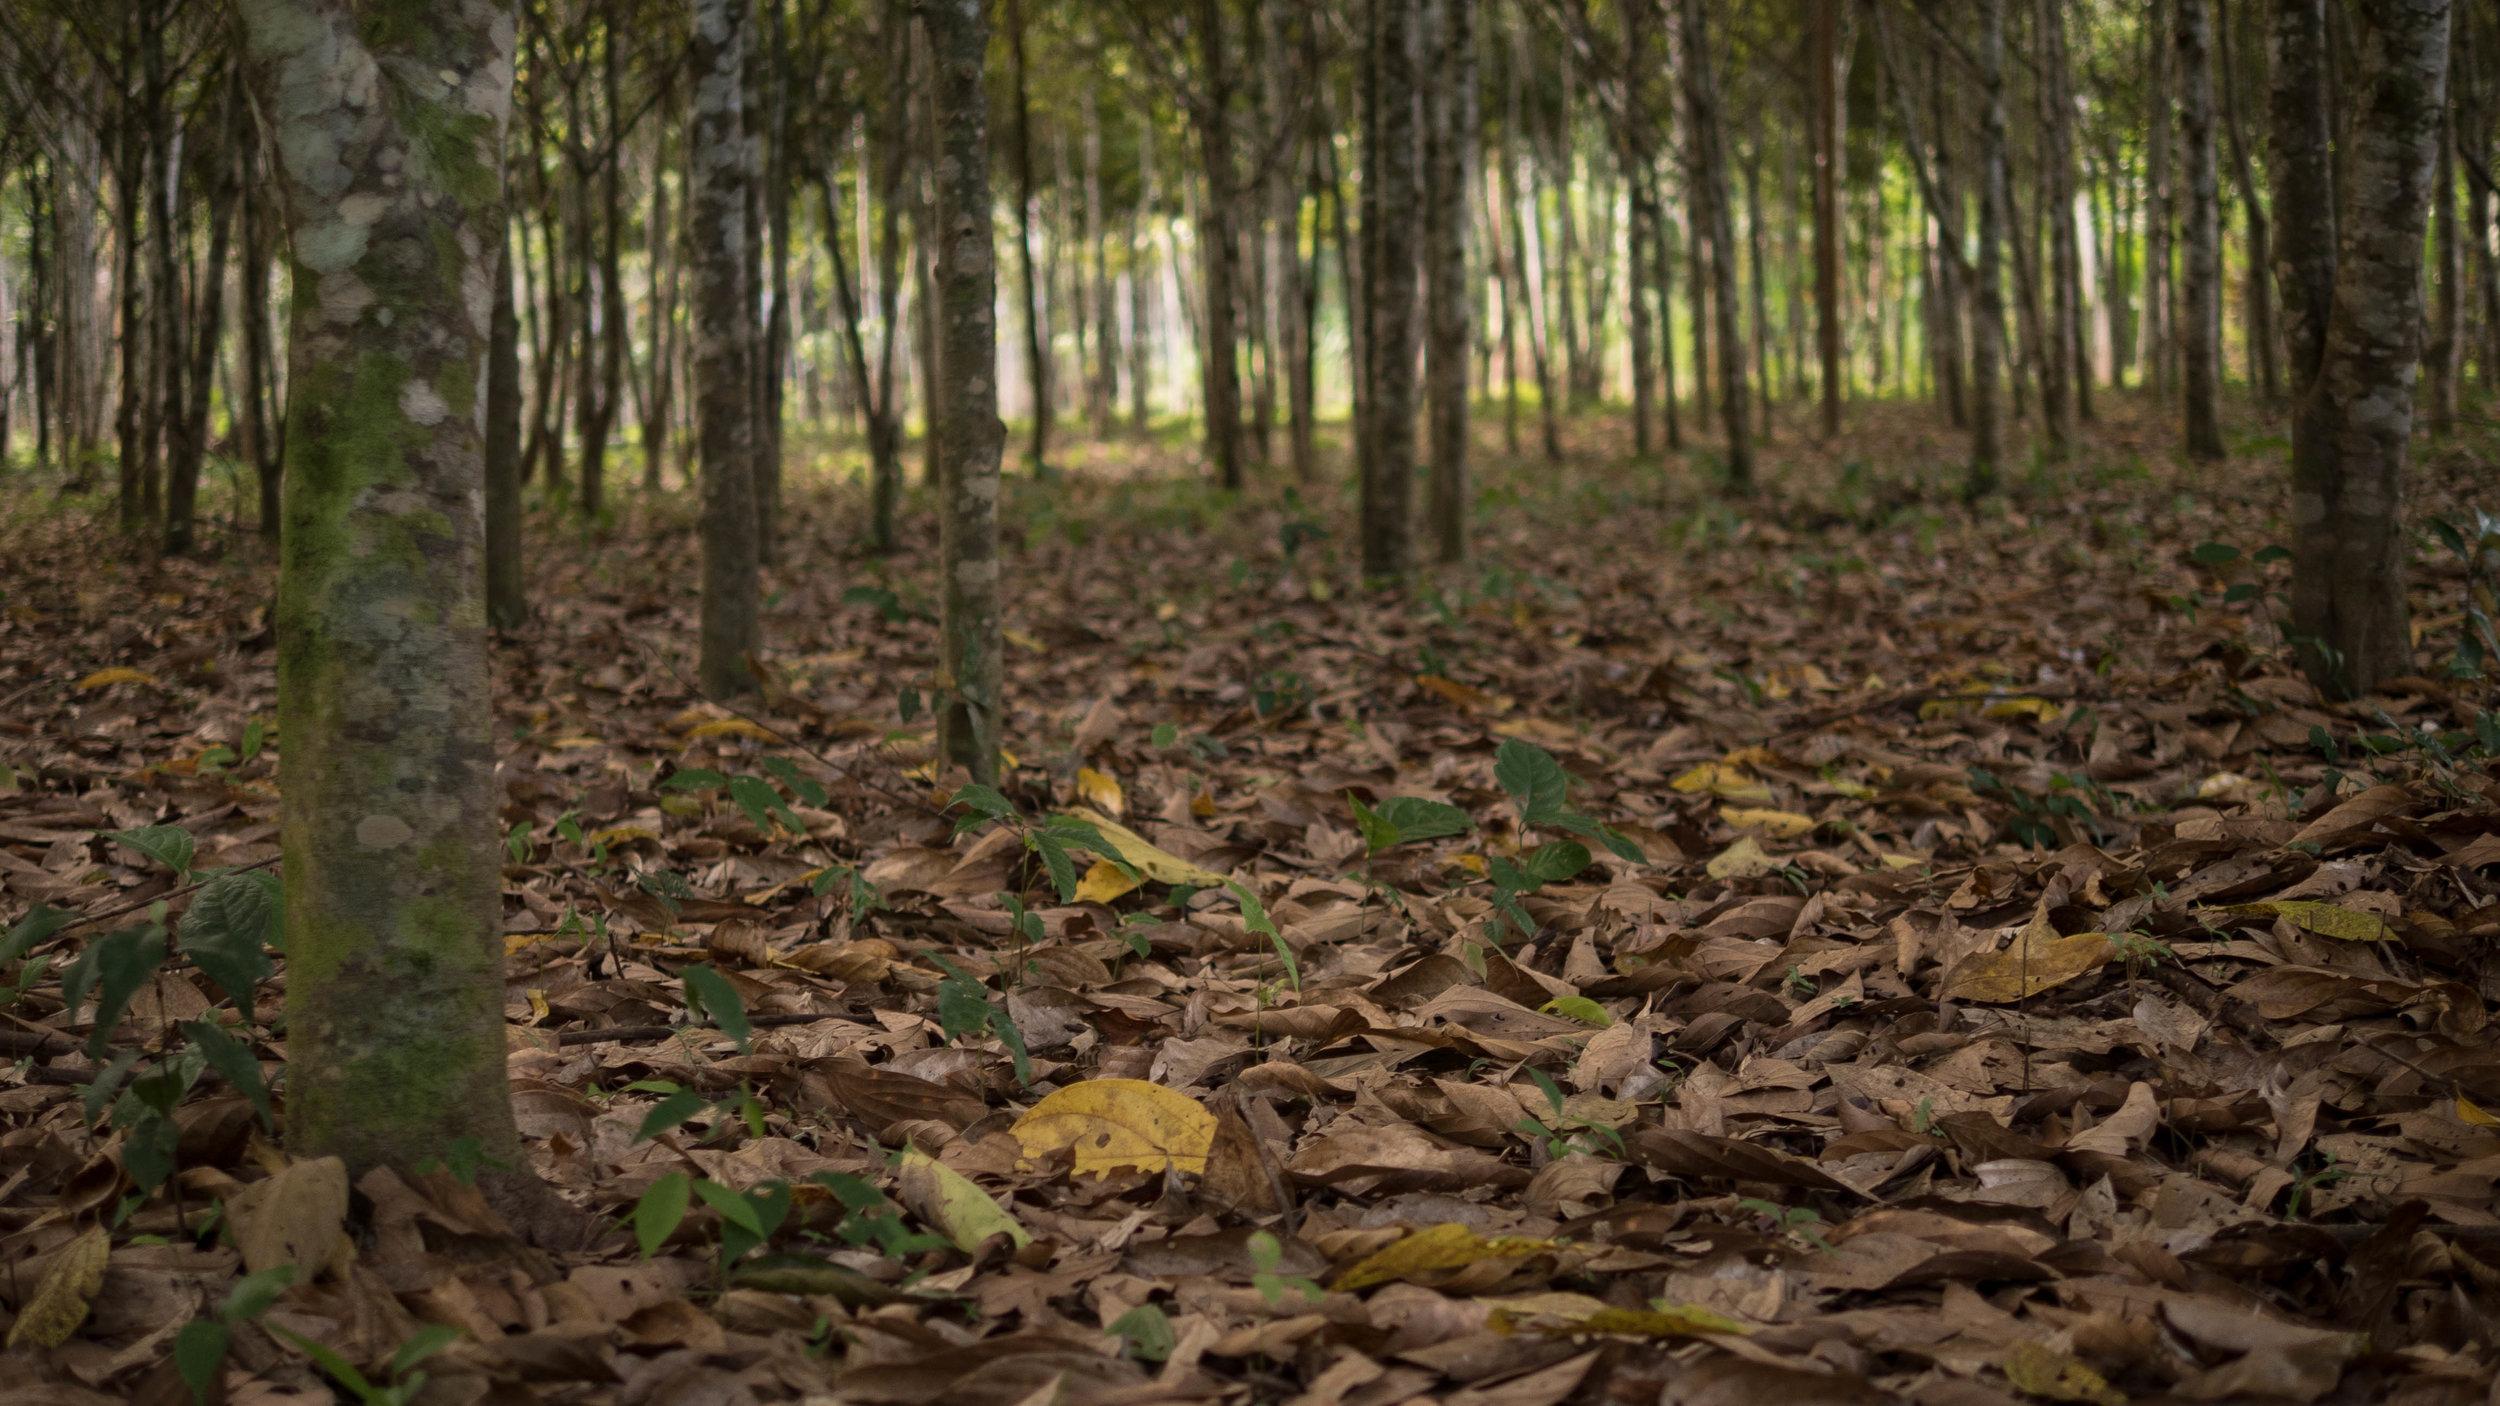 El Moenal - the Moena Alcanfor reforestation area